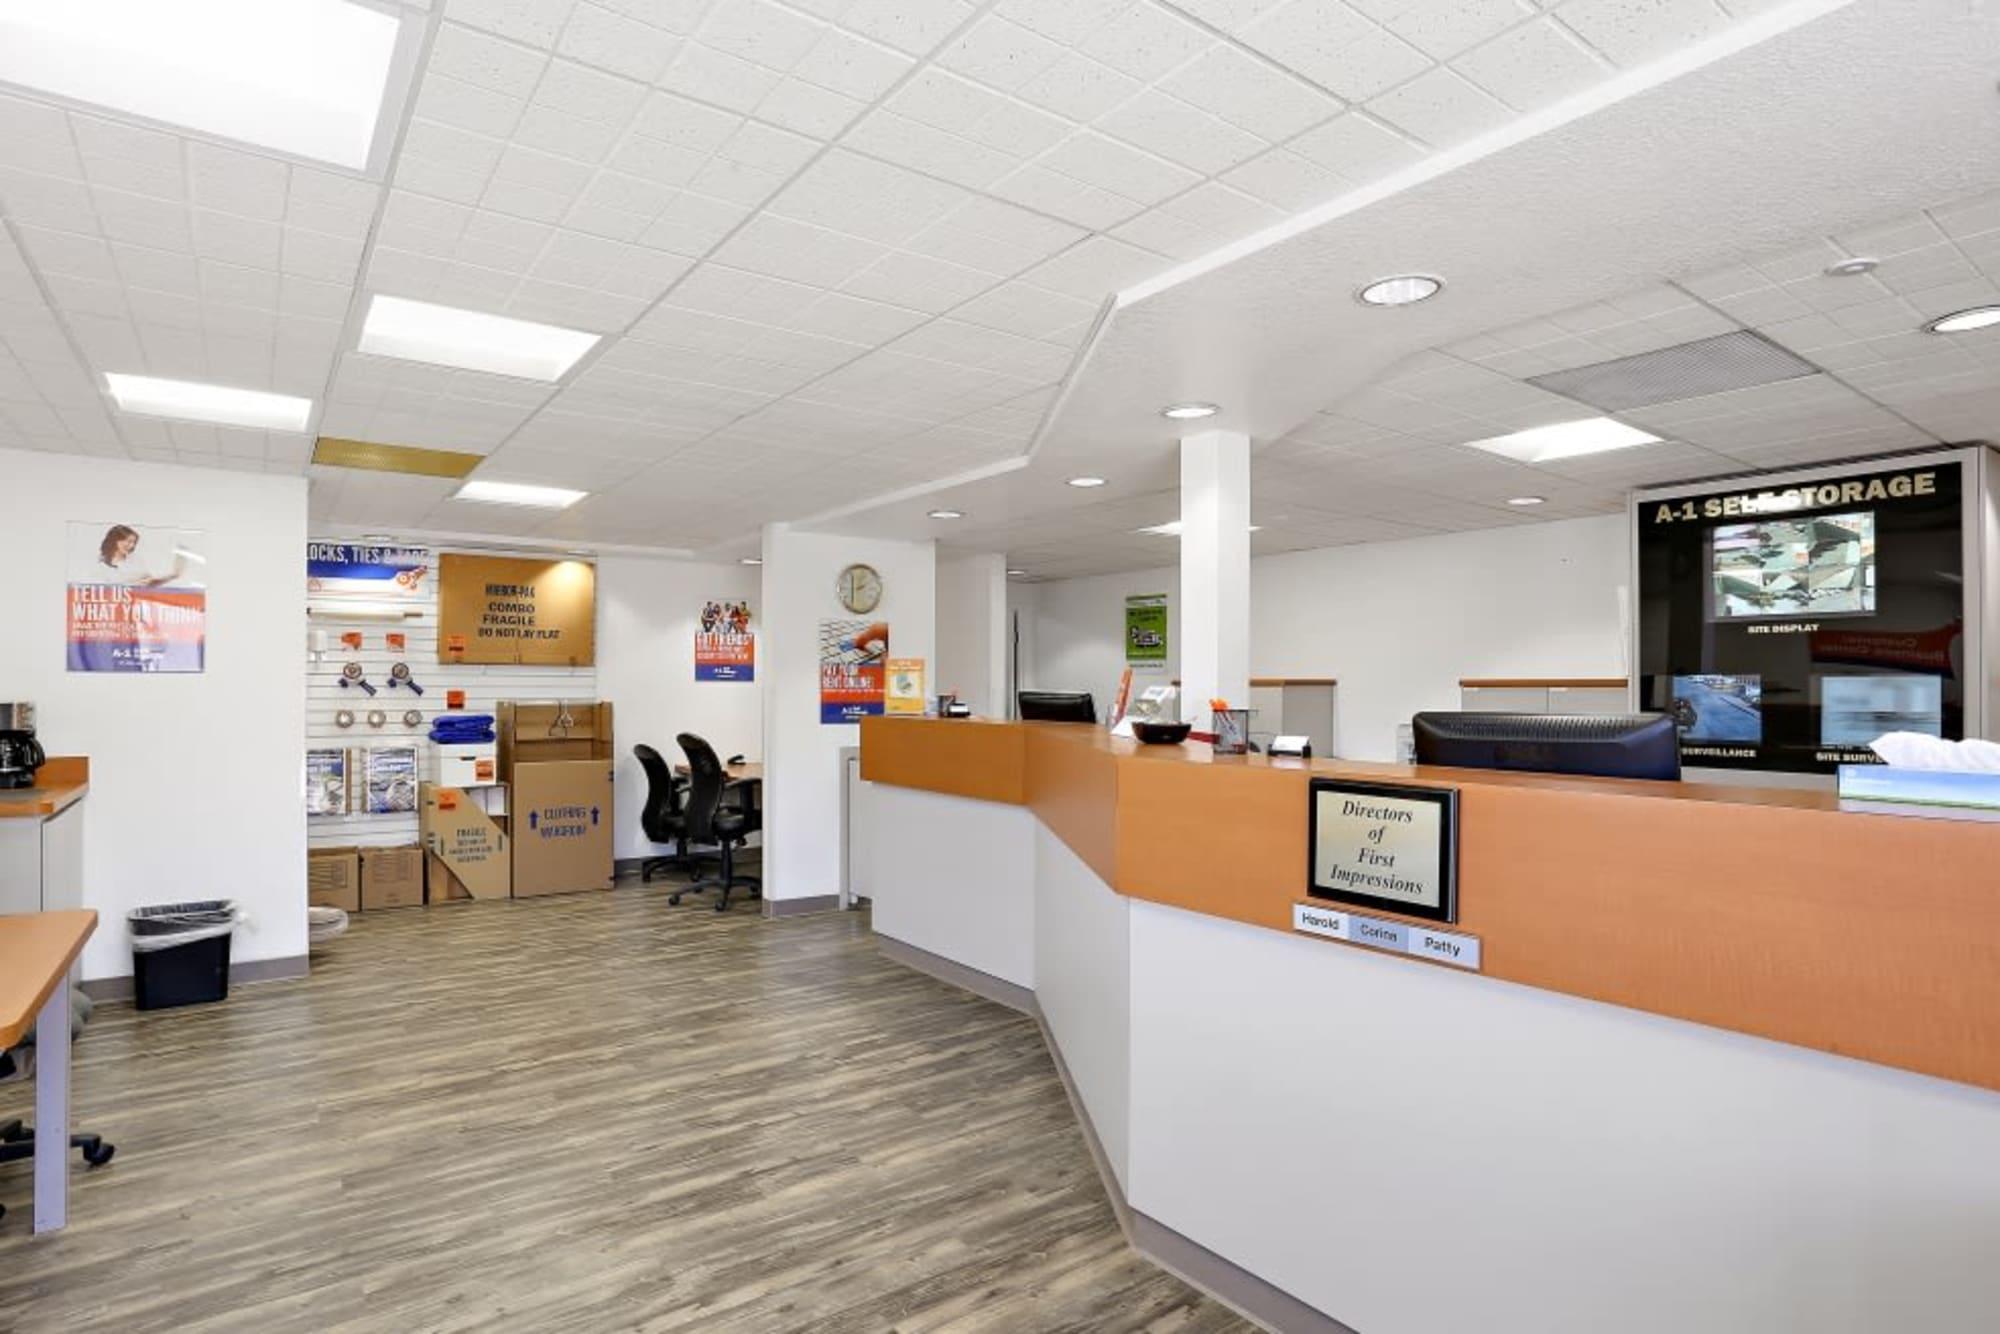 Large Self Storage Office at A-1 Self Storage in San Diego, CA